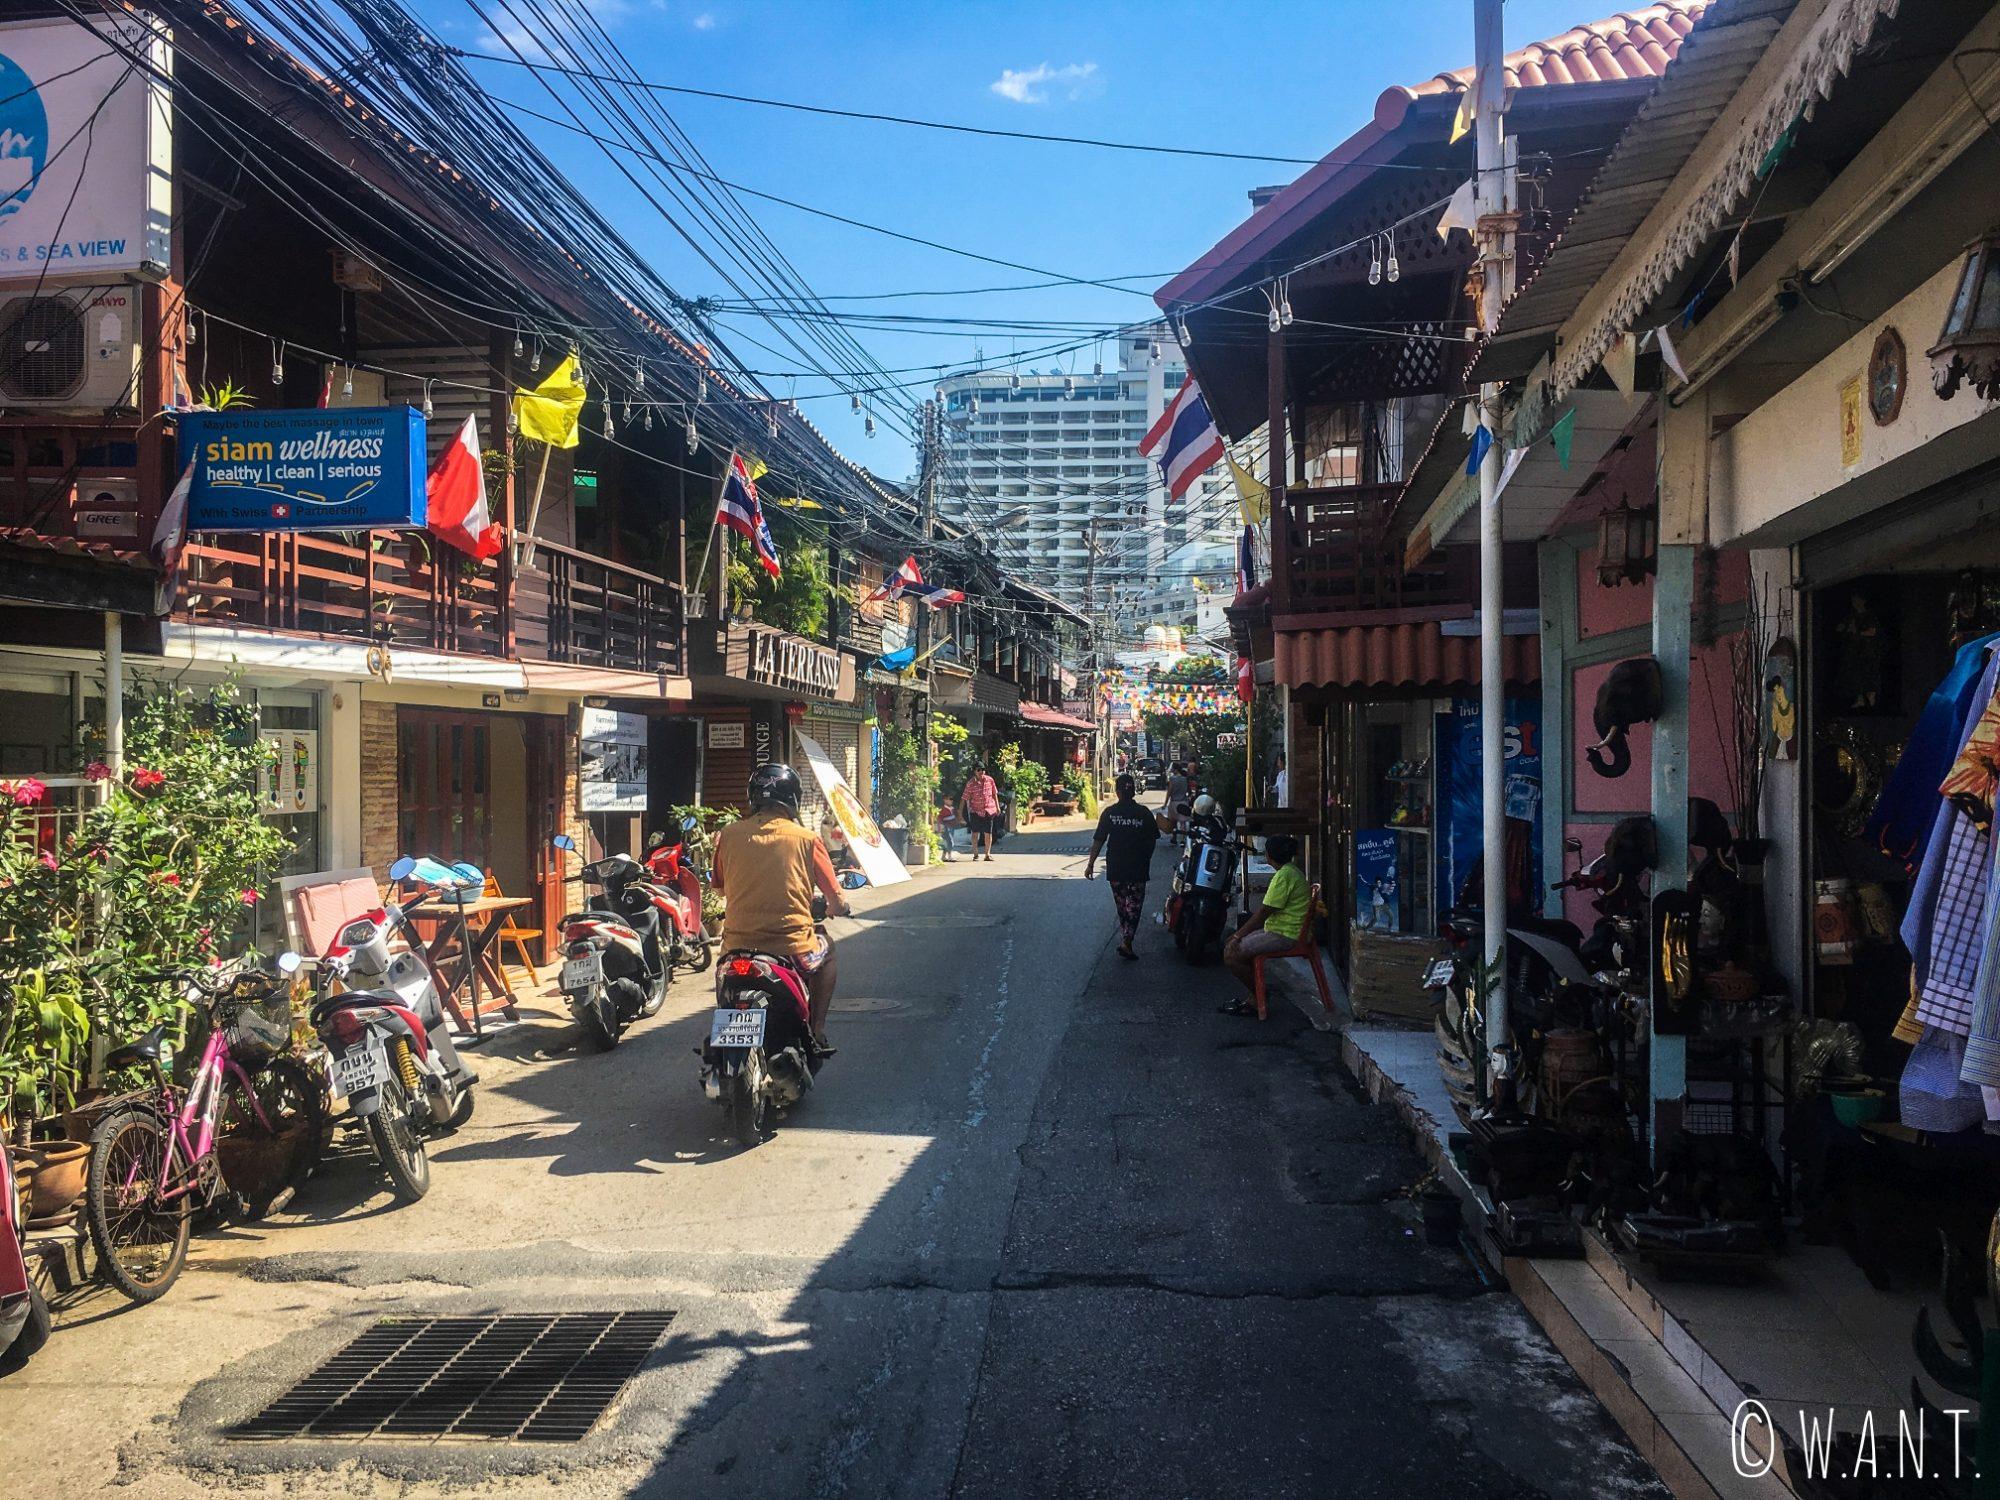 Rue de la station balnéaire de Hua Hin